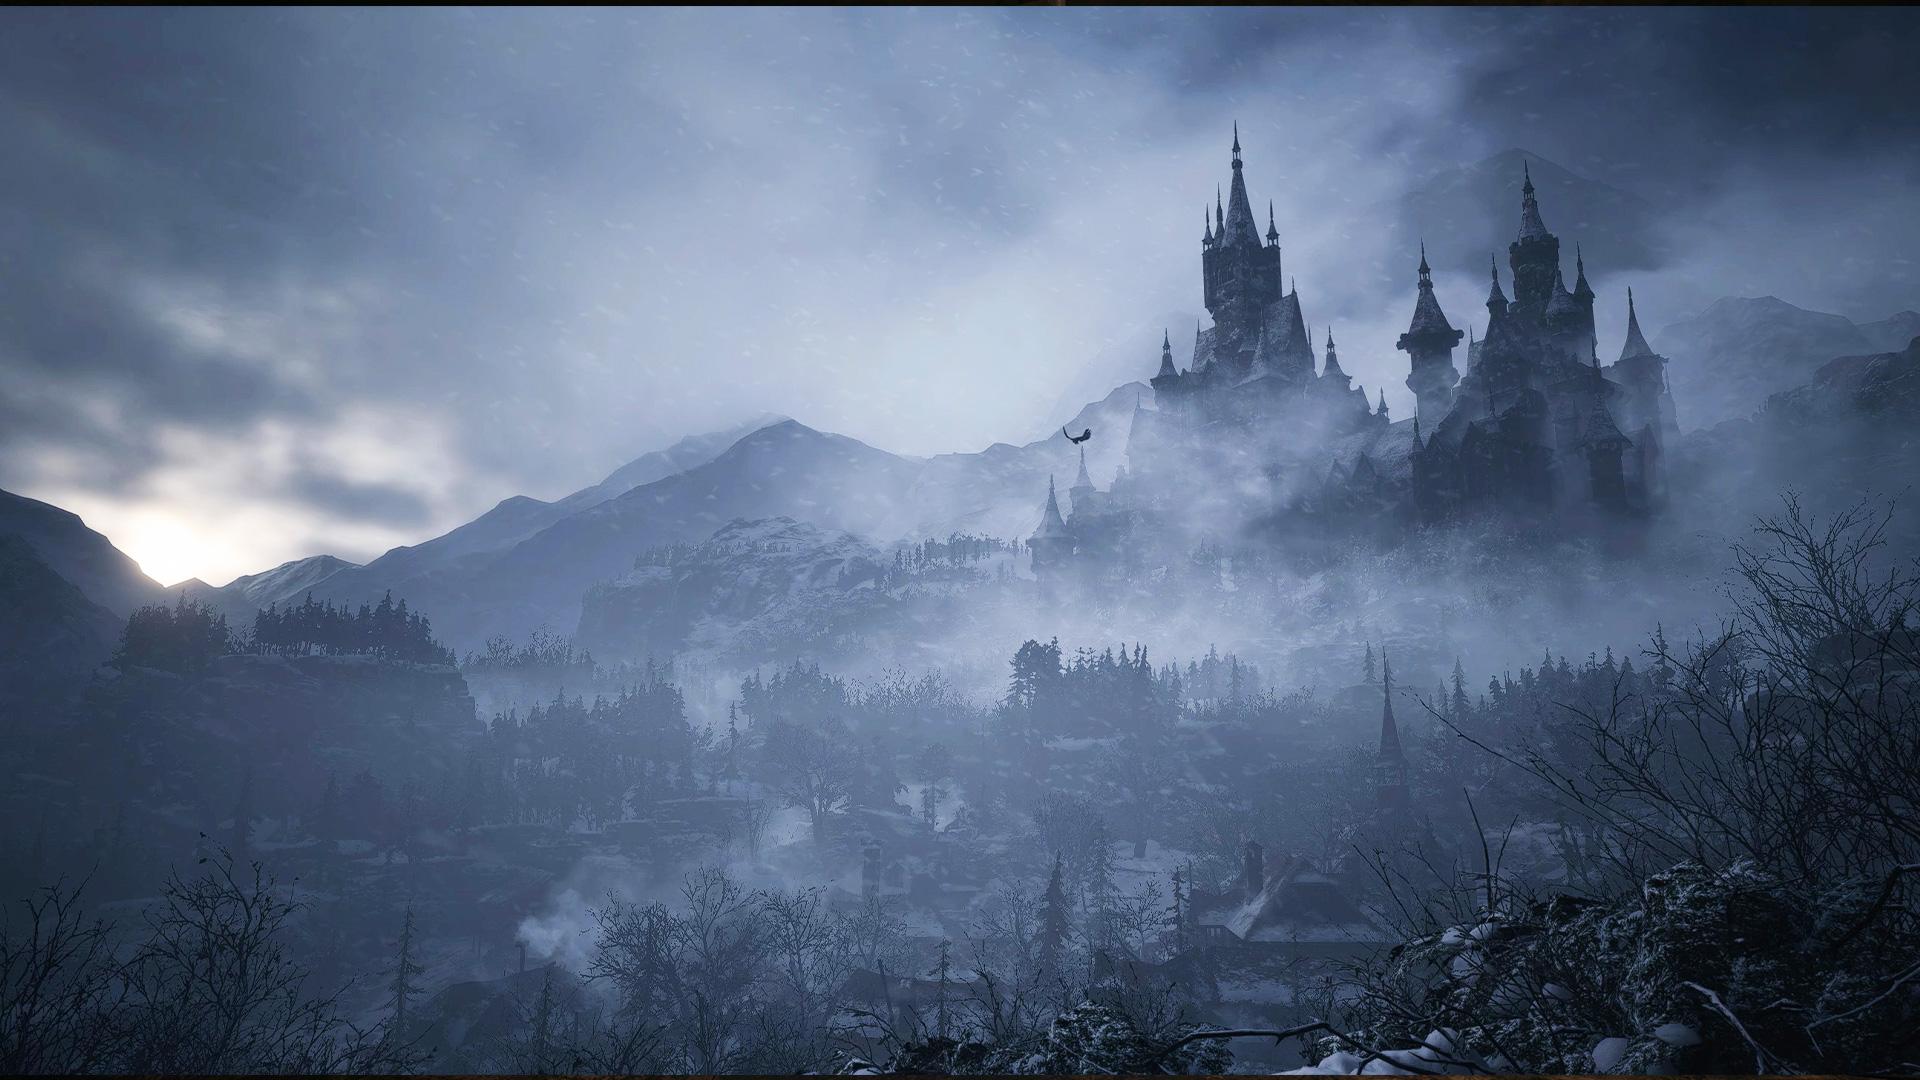 Capcom optimises Resident Evil Village's DRM, and adds AMD FSR to boost fps